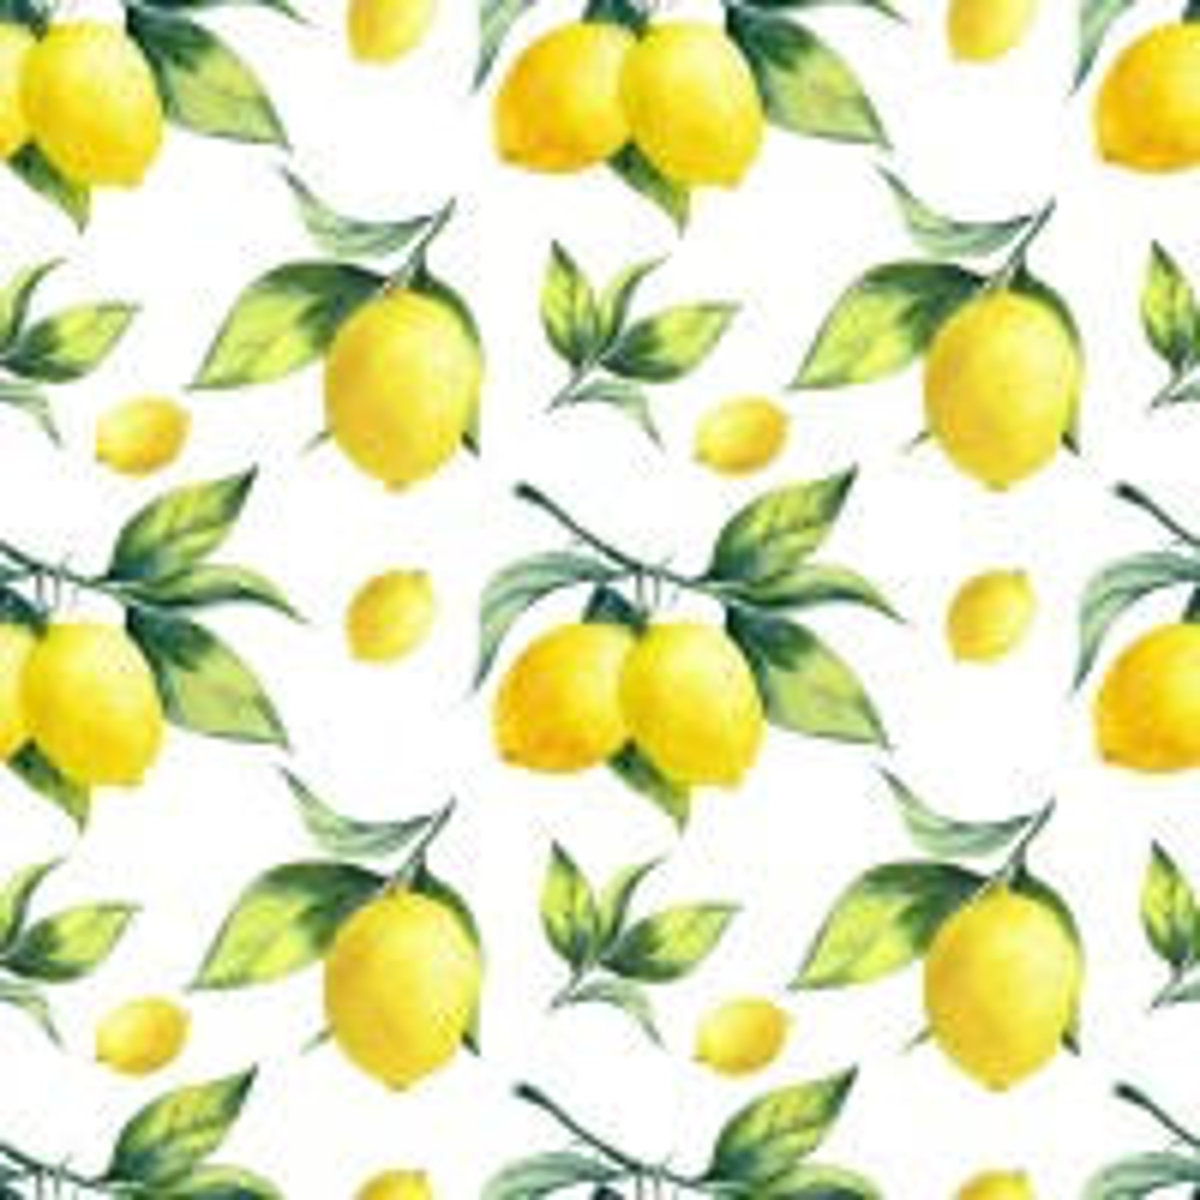 Lemon with Leaf Wallpaper Mural